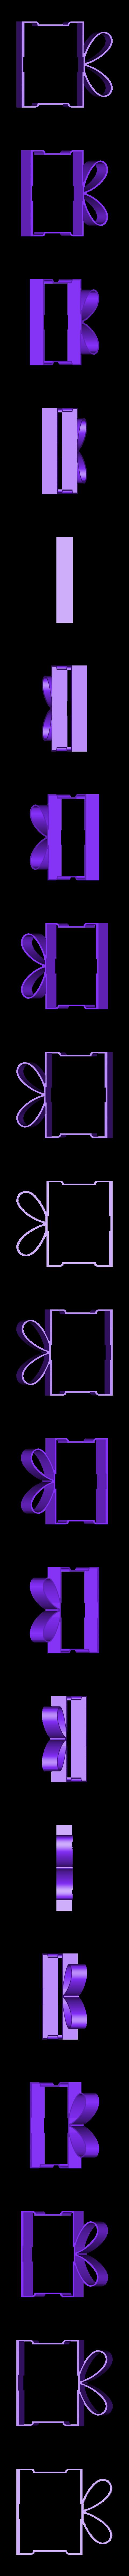 Ribbon 1.stl Download free STL file Simple Secret Box V:  Gift Box Edition • Model to 3D print, gzumwalt